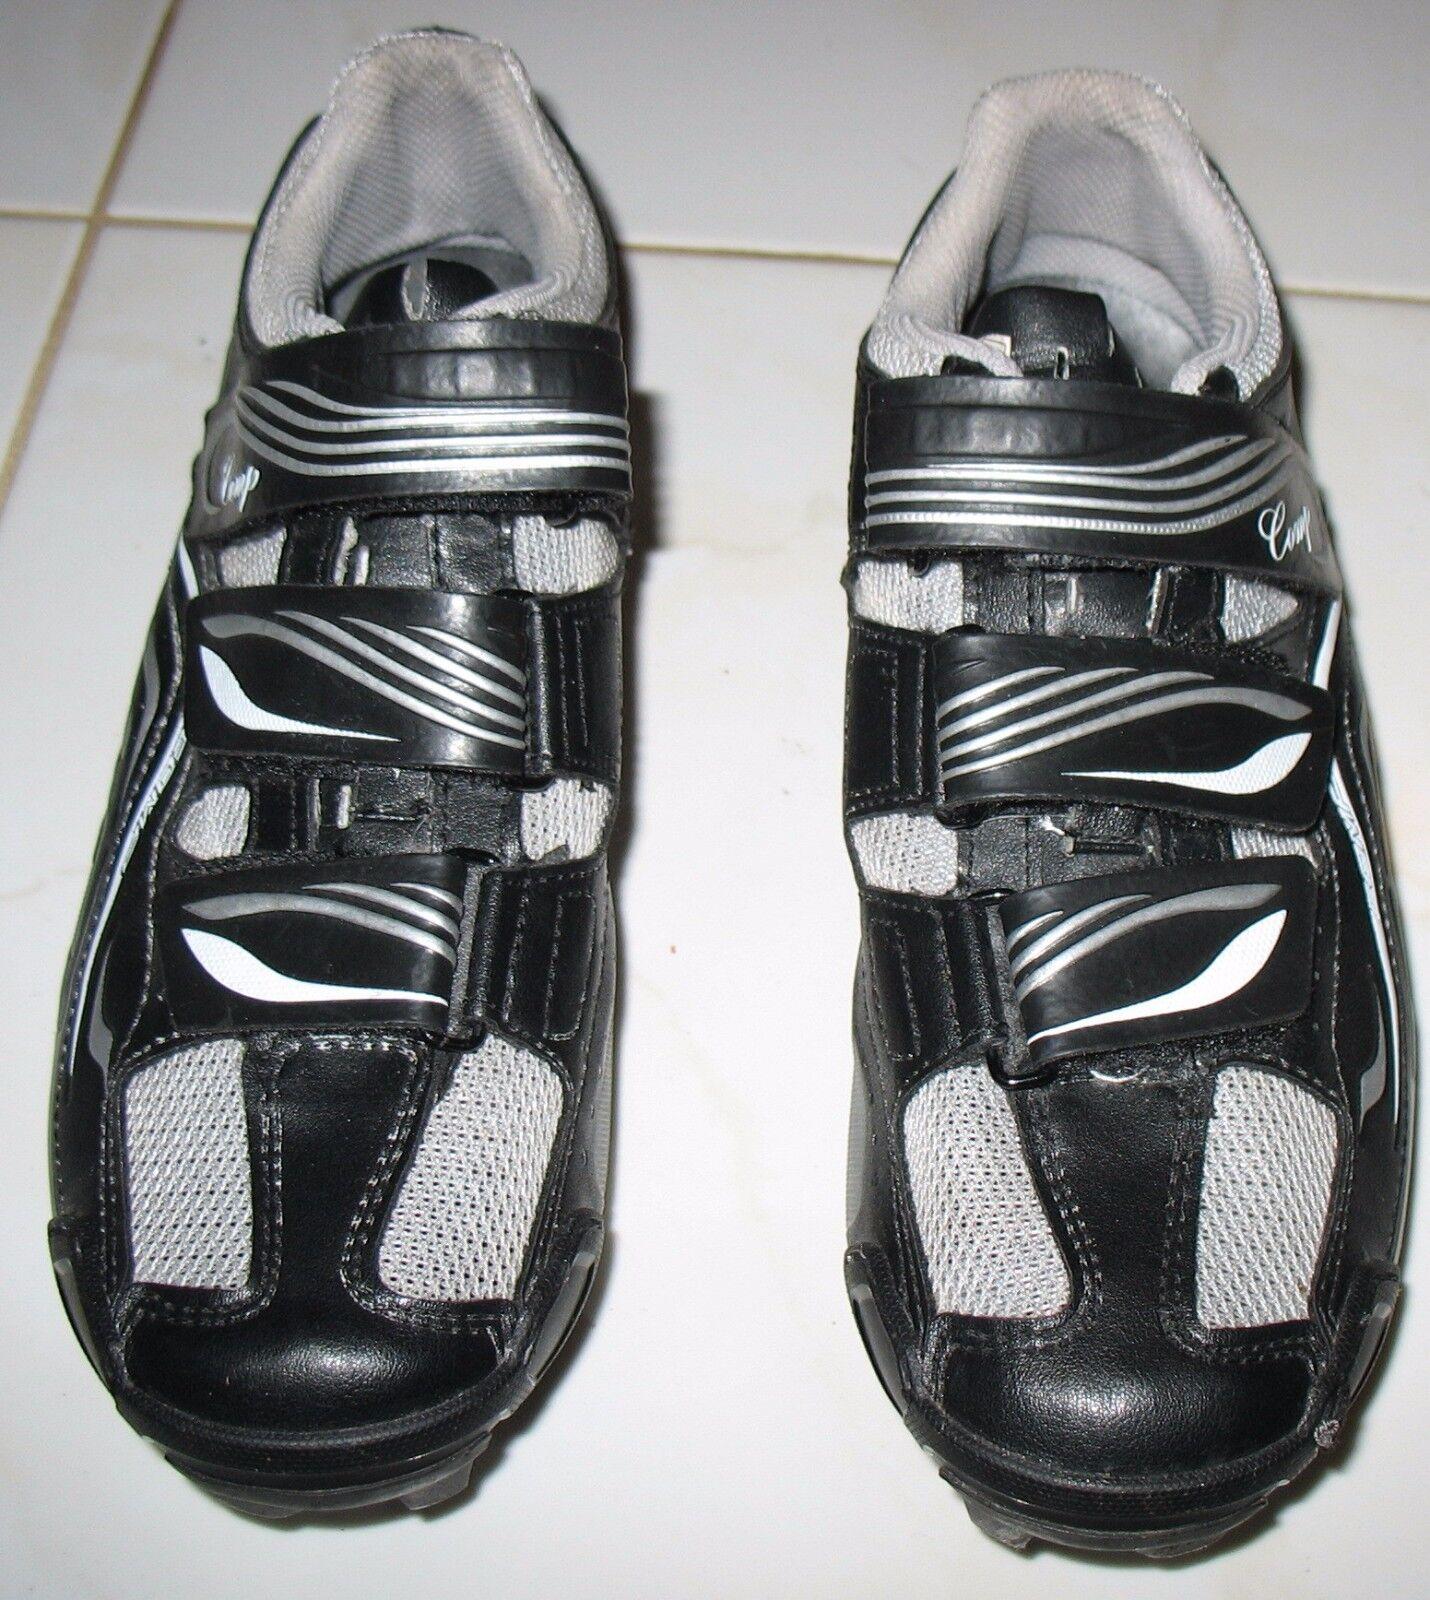 SCOTT - Schuhe  COMP CYCLING Lady Schuhe -  EUR 38  - U.S. 6.5 -  UK 5 - HOOK/LOOP CLOSURE d86ada